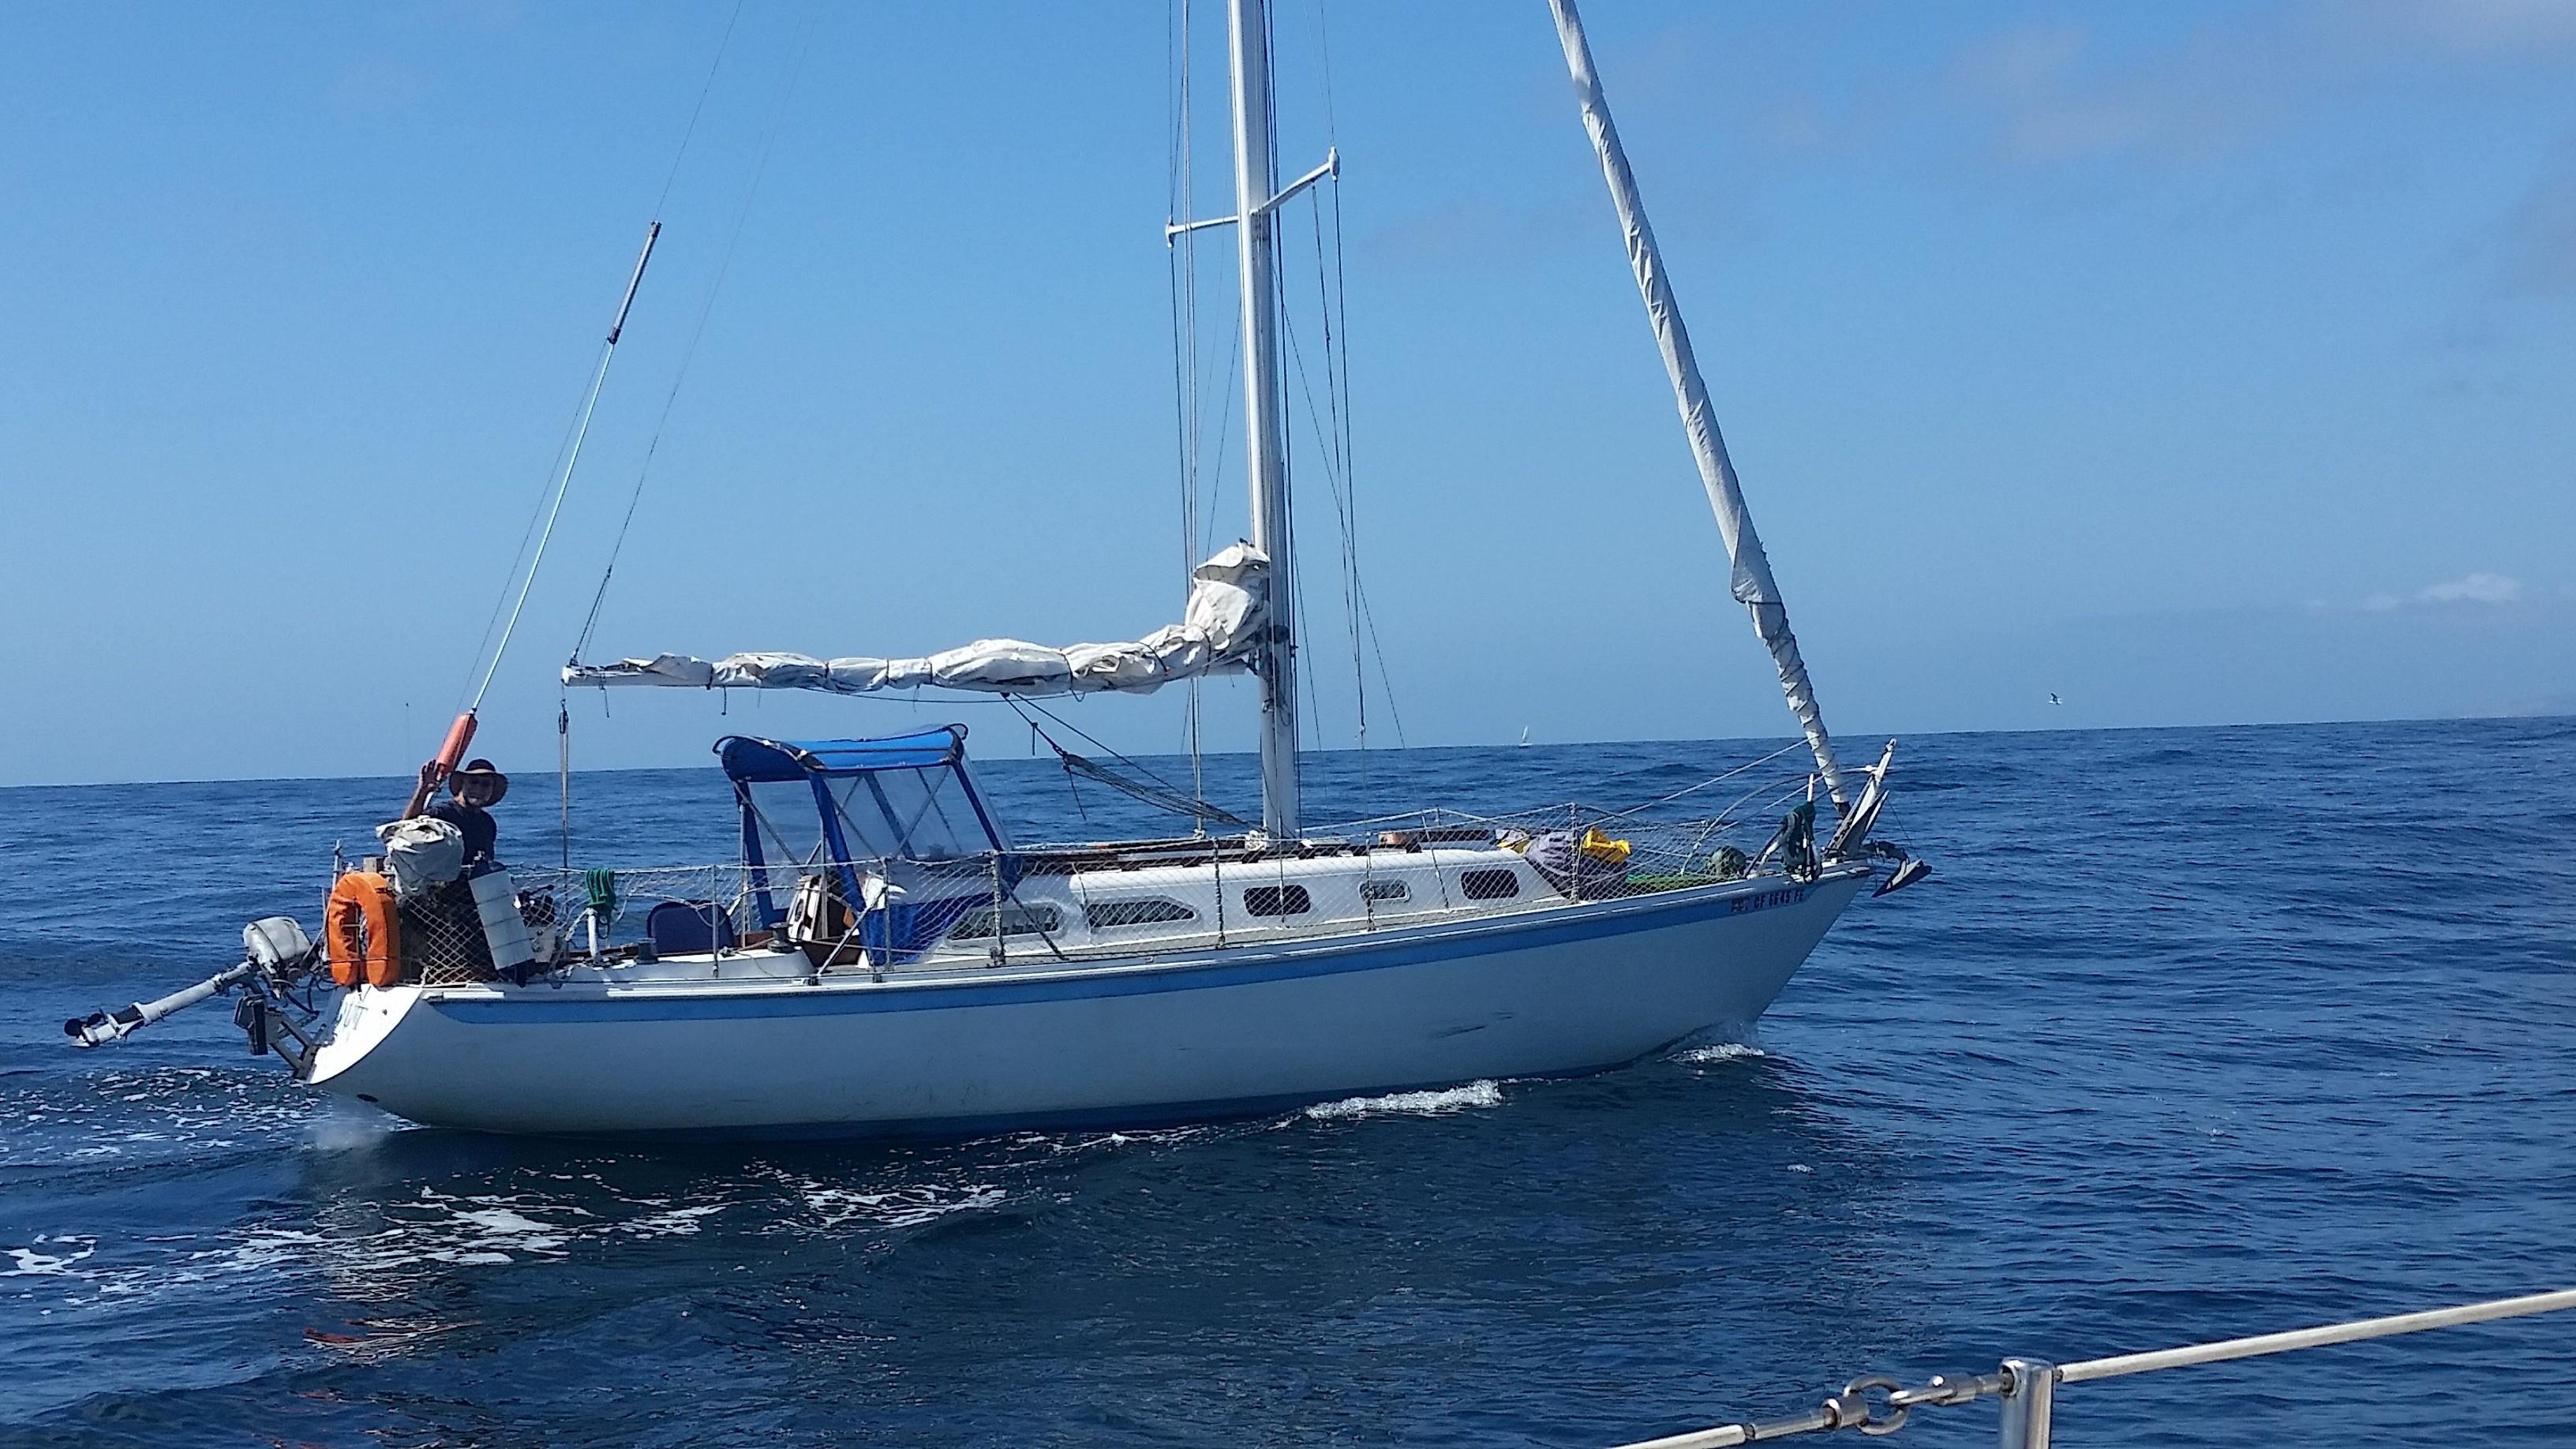 32' Ericson 32+Boat for sale!